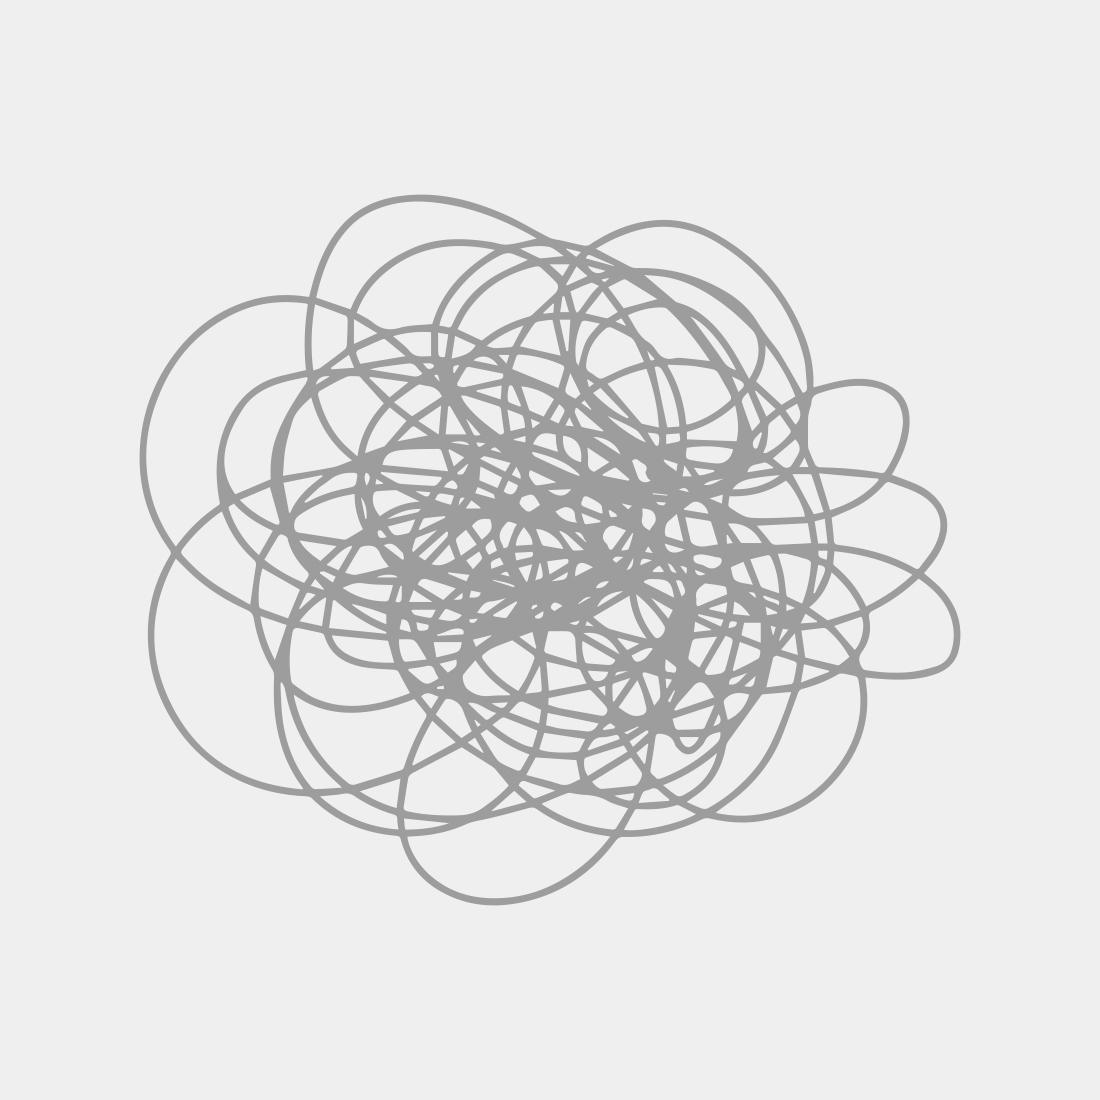 Albert Irvin OBE RA Untitled opus w.12 (framed)